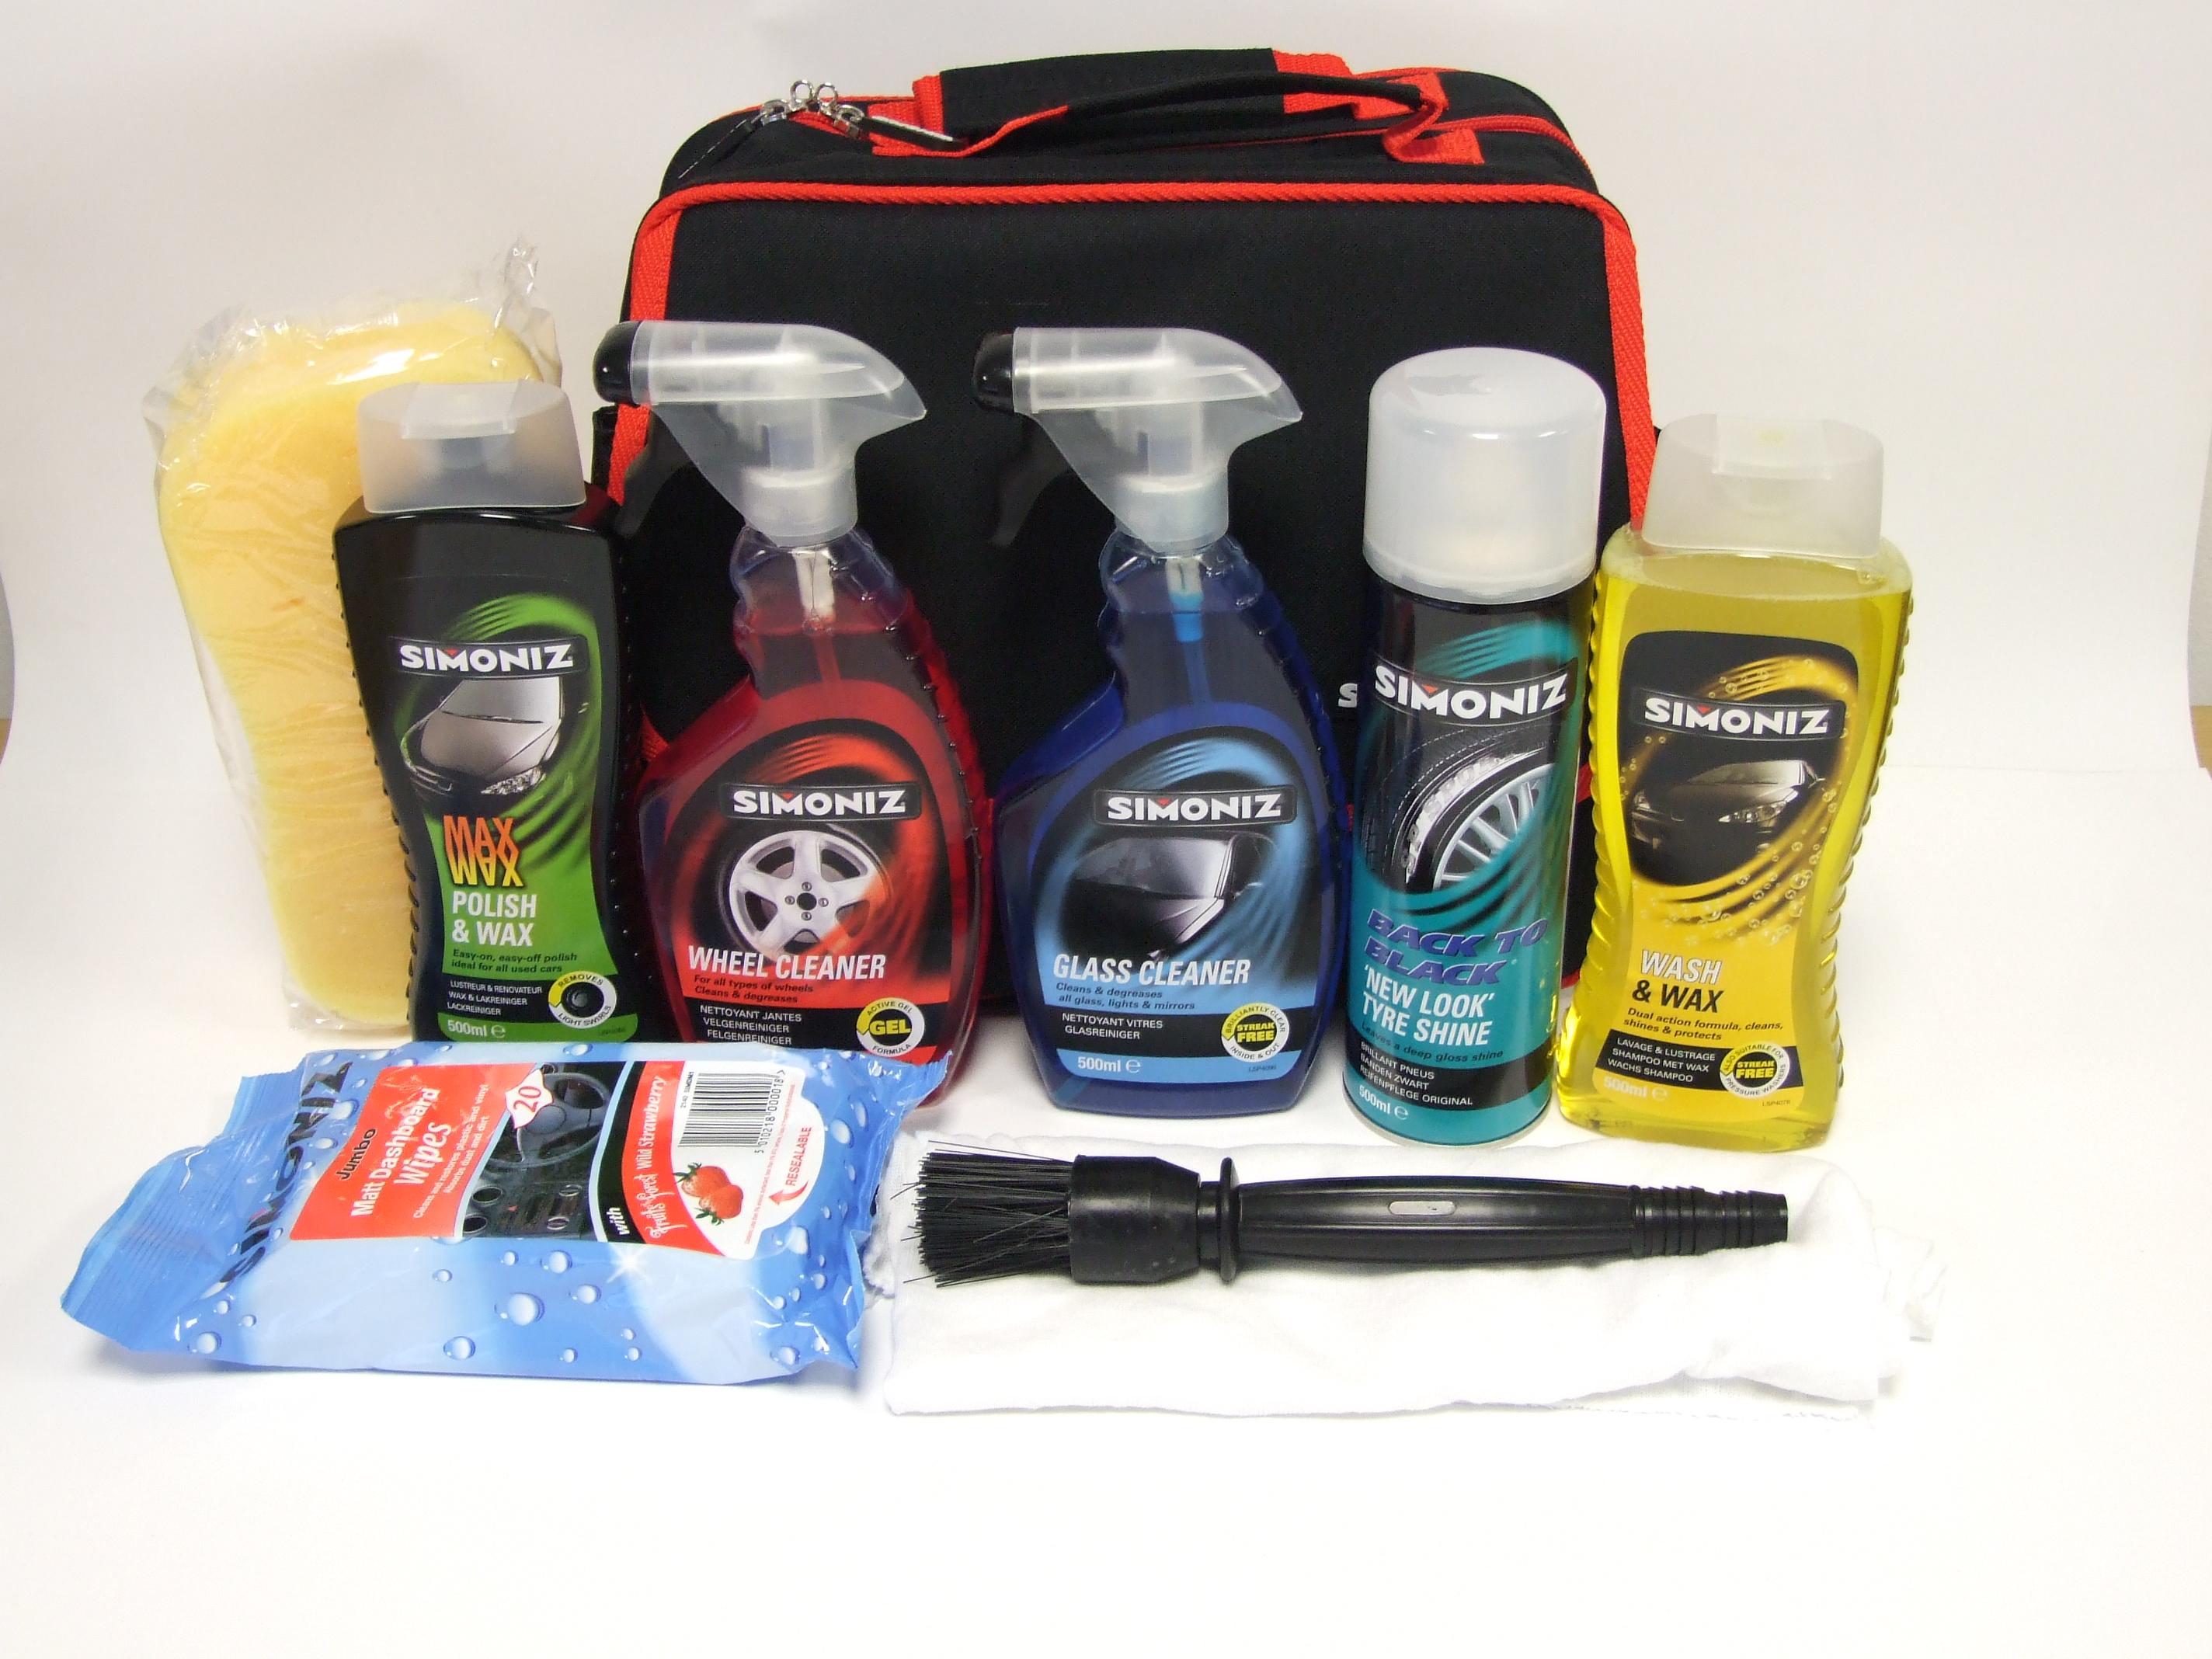 premium simoniz full car cleaning valeting detailing kit with bag 10 items ebay. Black Bedroom Furniture Sets. Home Design Ideas